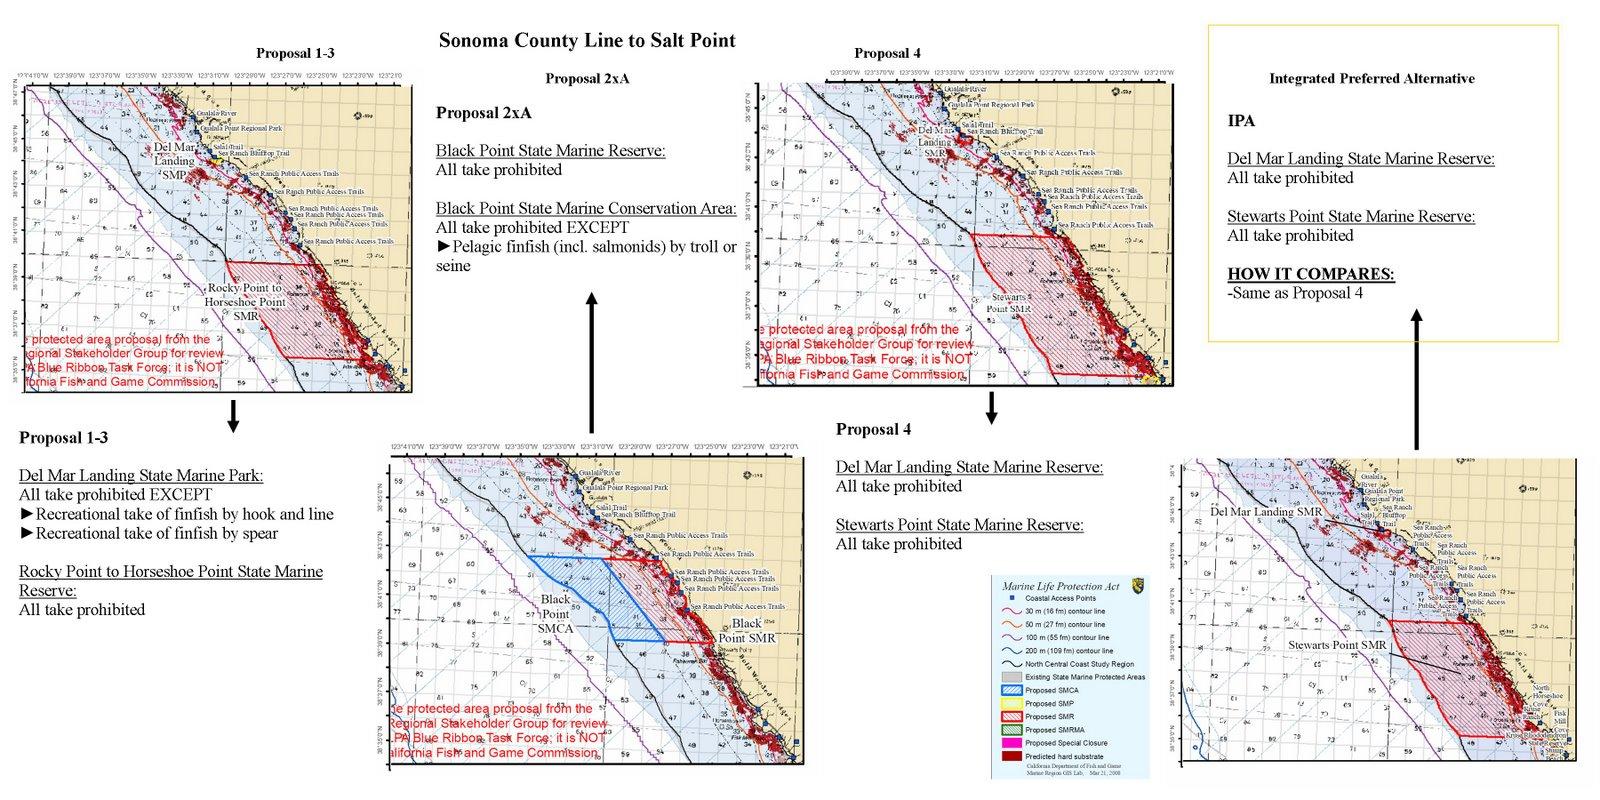 Sonoma County to Salt Point